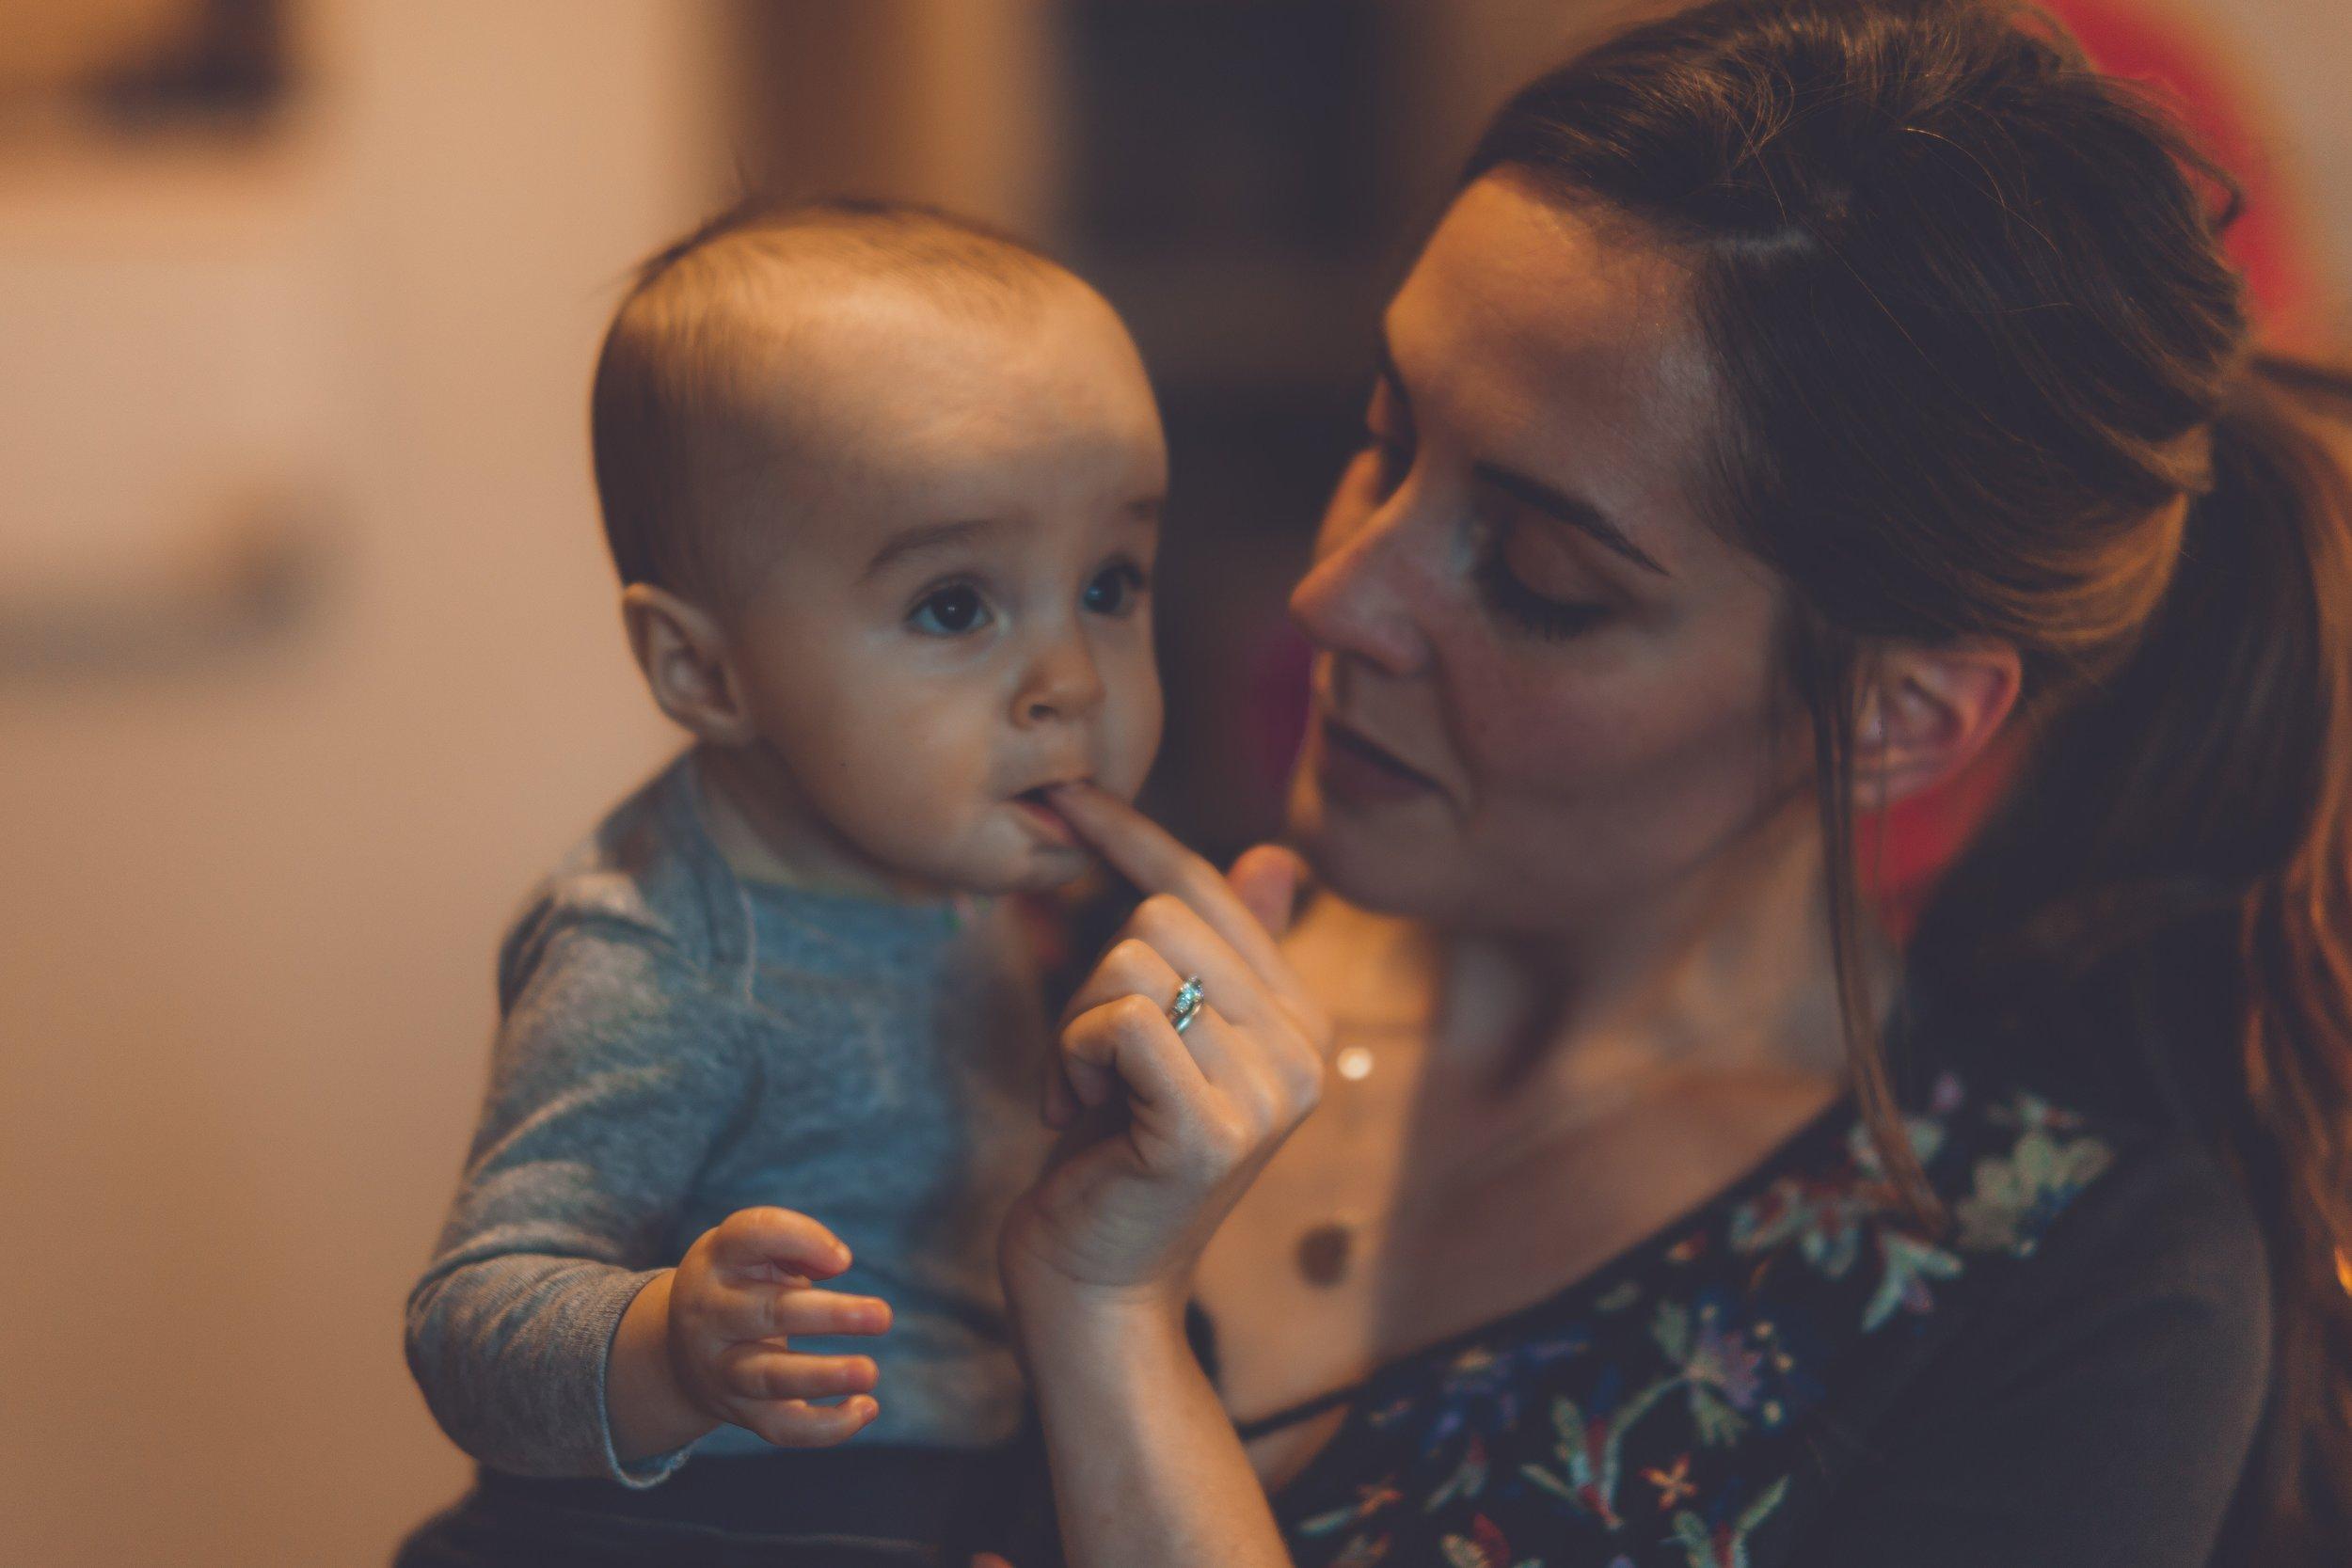 adult-baby-biting-1693744 (1).jpg